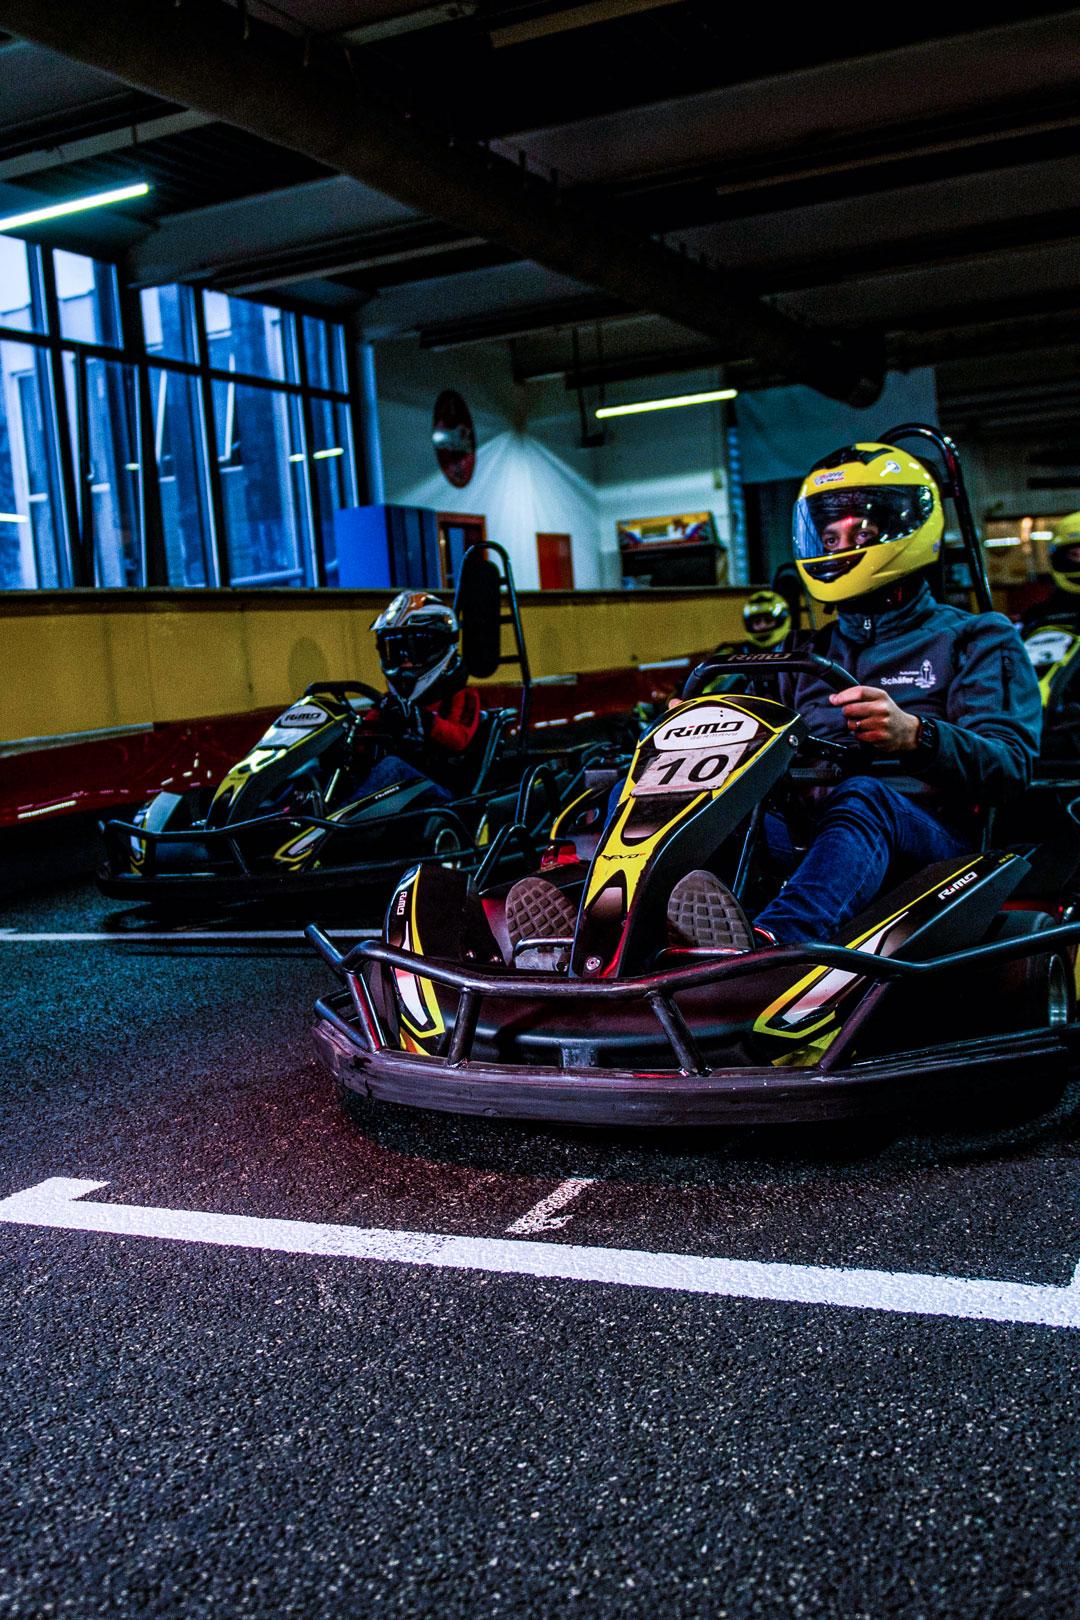 Sportliches Design des RiMO Karts